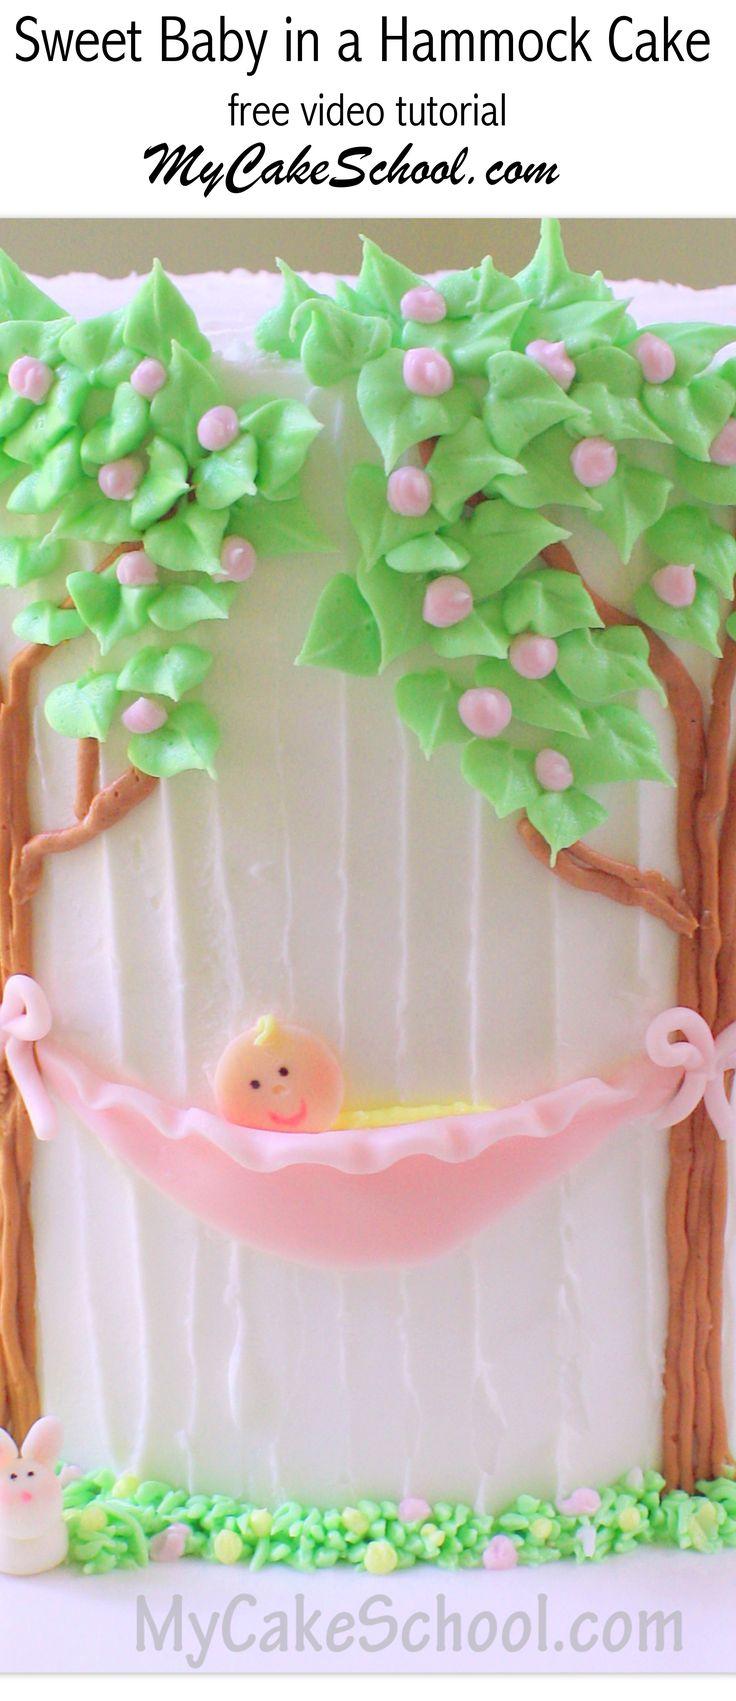 17 Best ideas about Cake Designs on Pinterest | Cake ideas ...